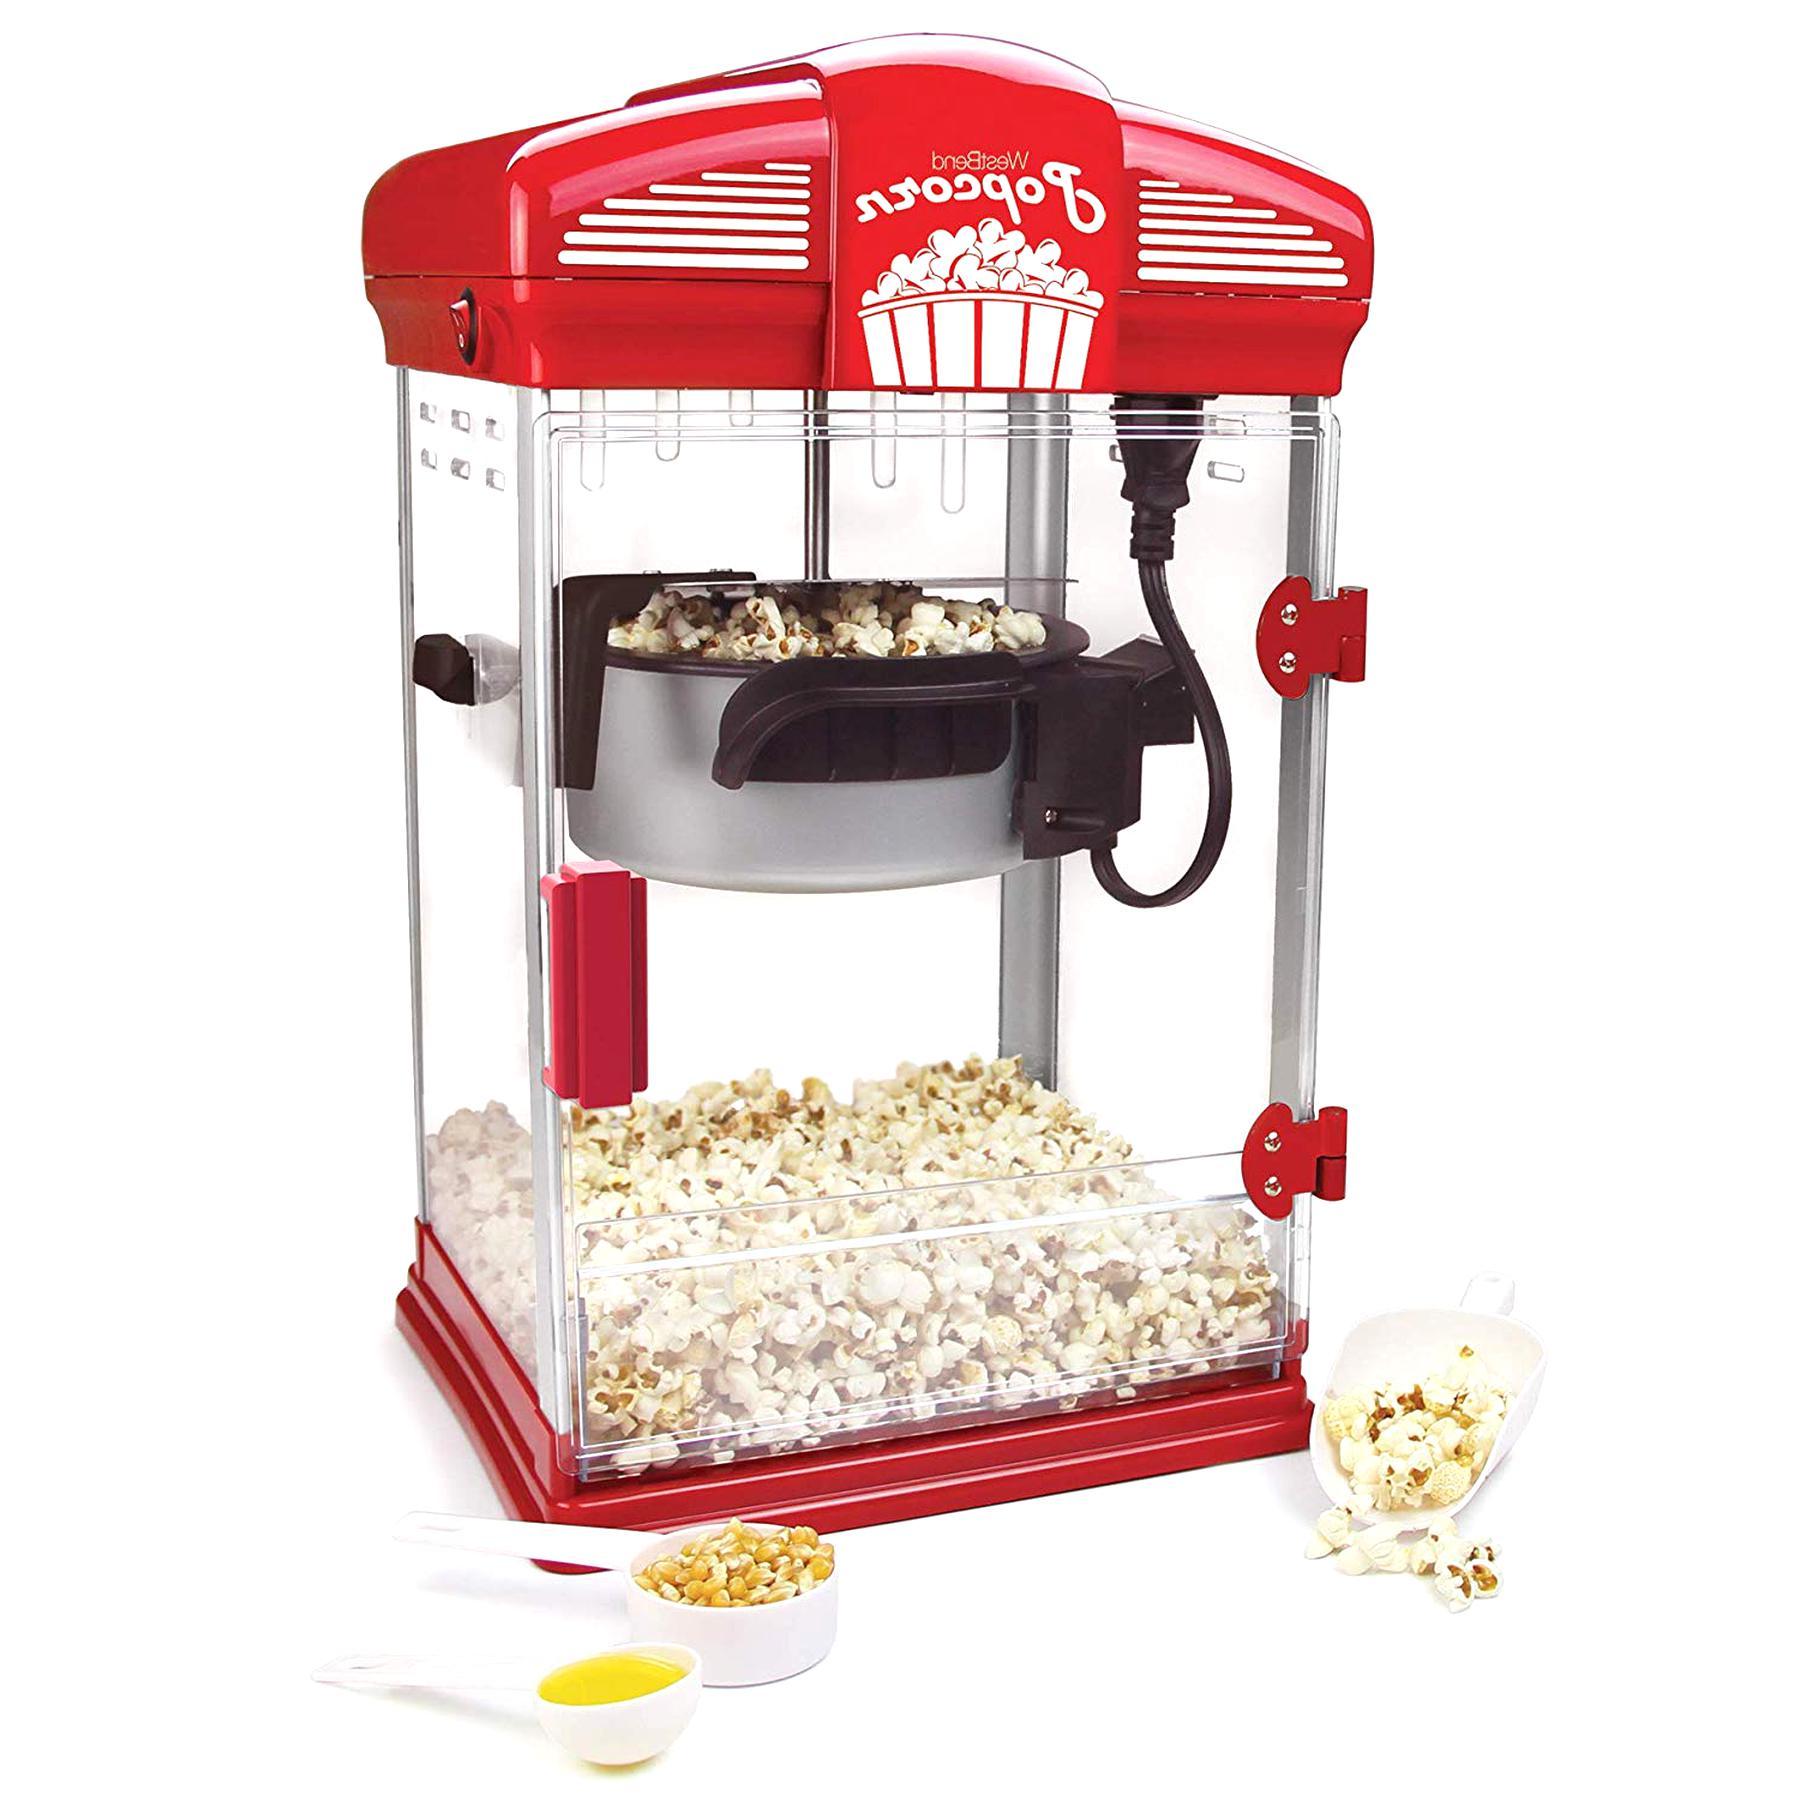 west bend popcorn popper for sale